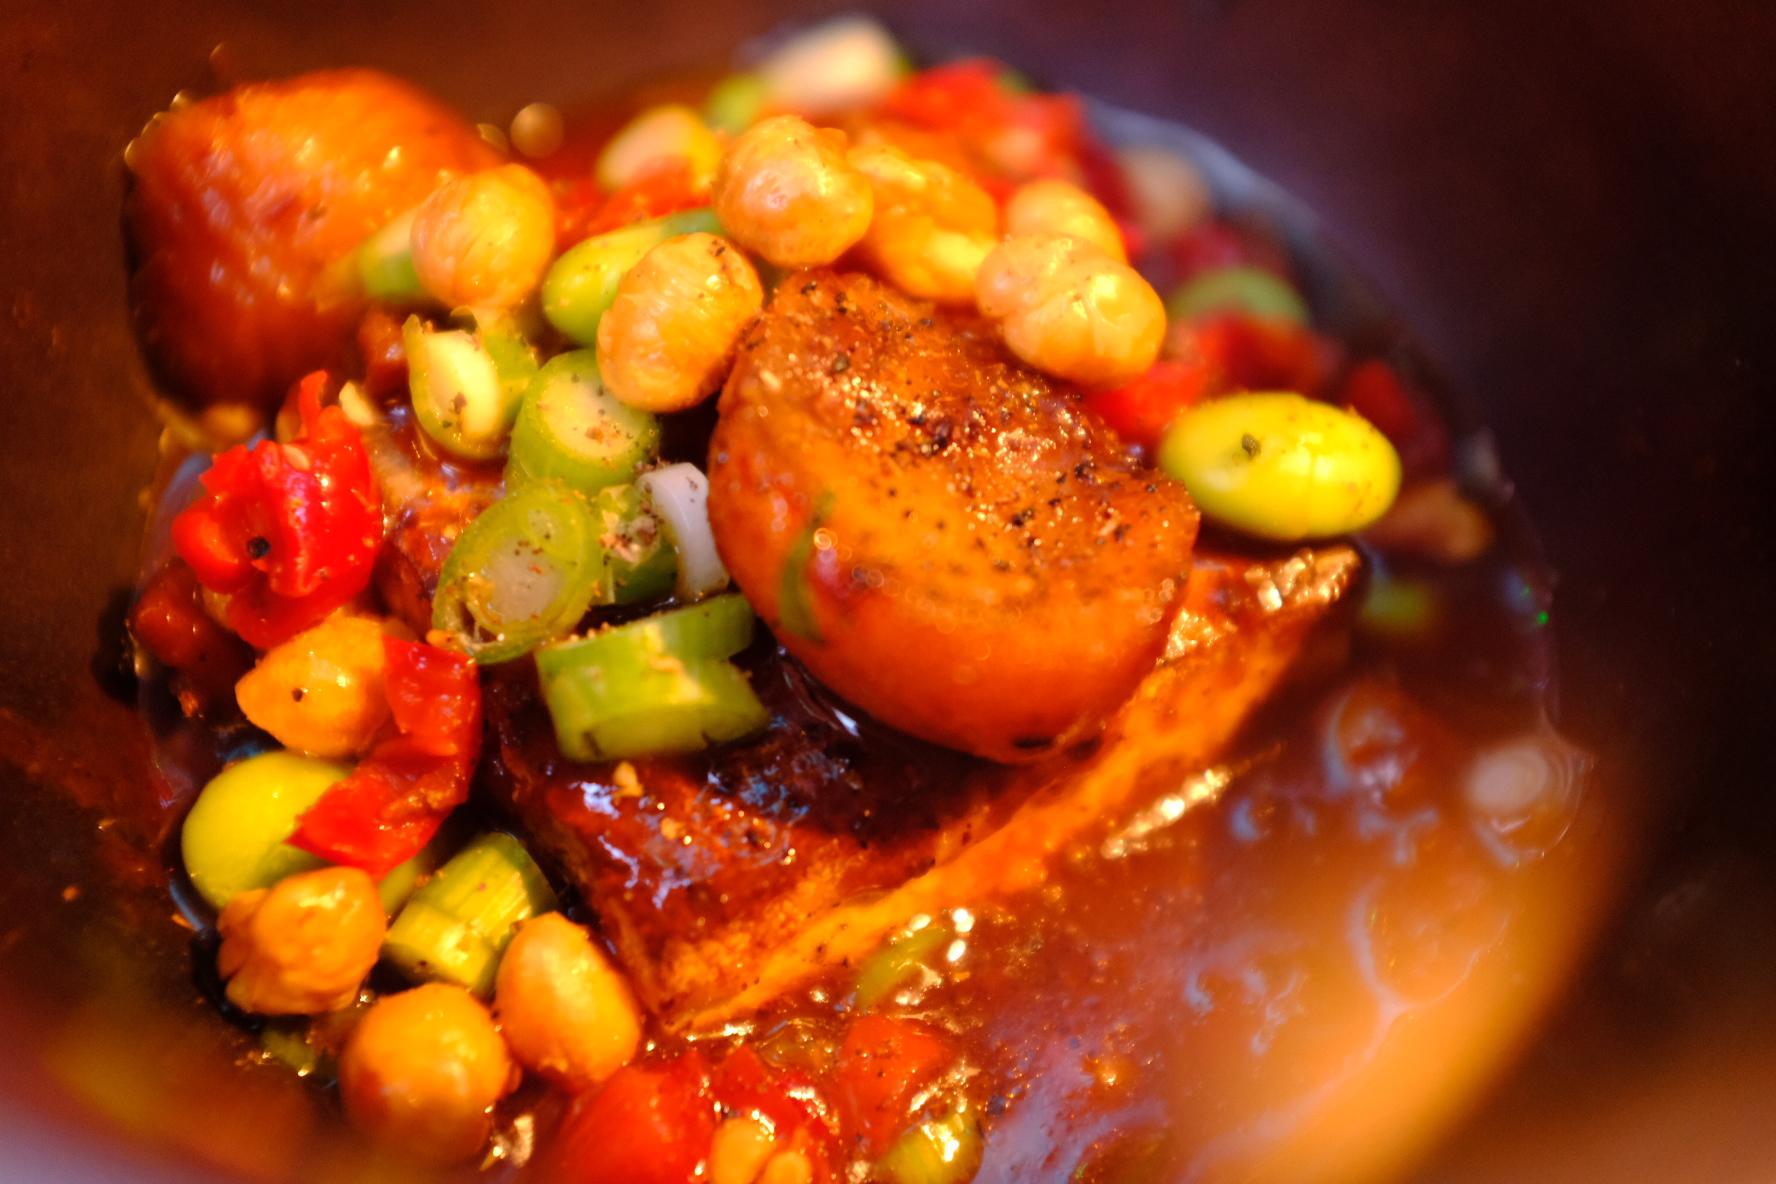 Flathead, tofu, chest nuts in pickled chilli broth